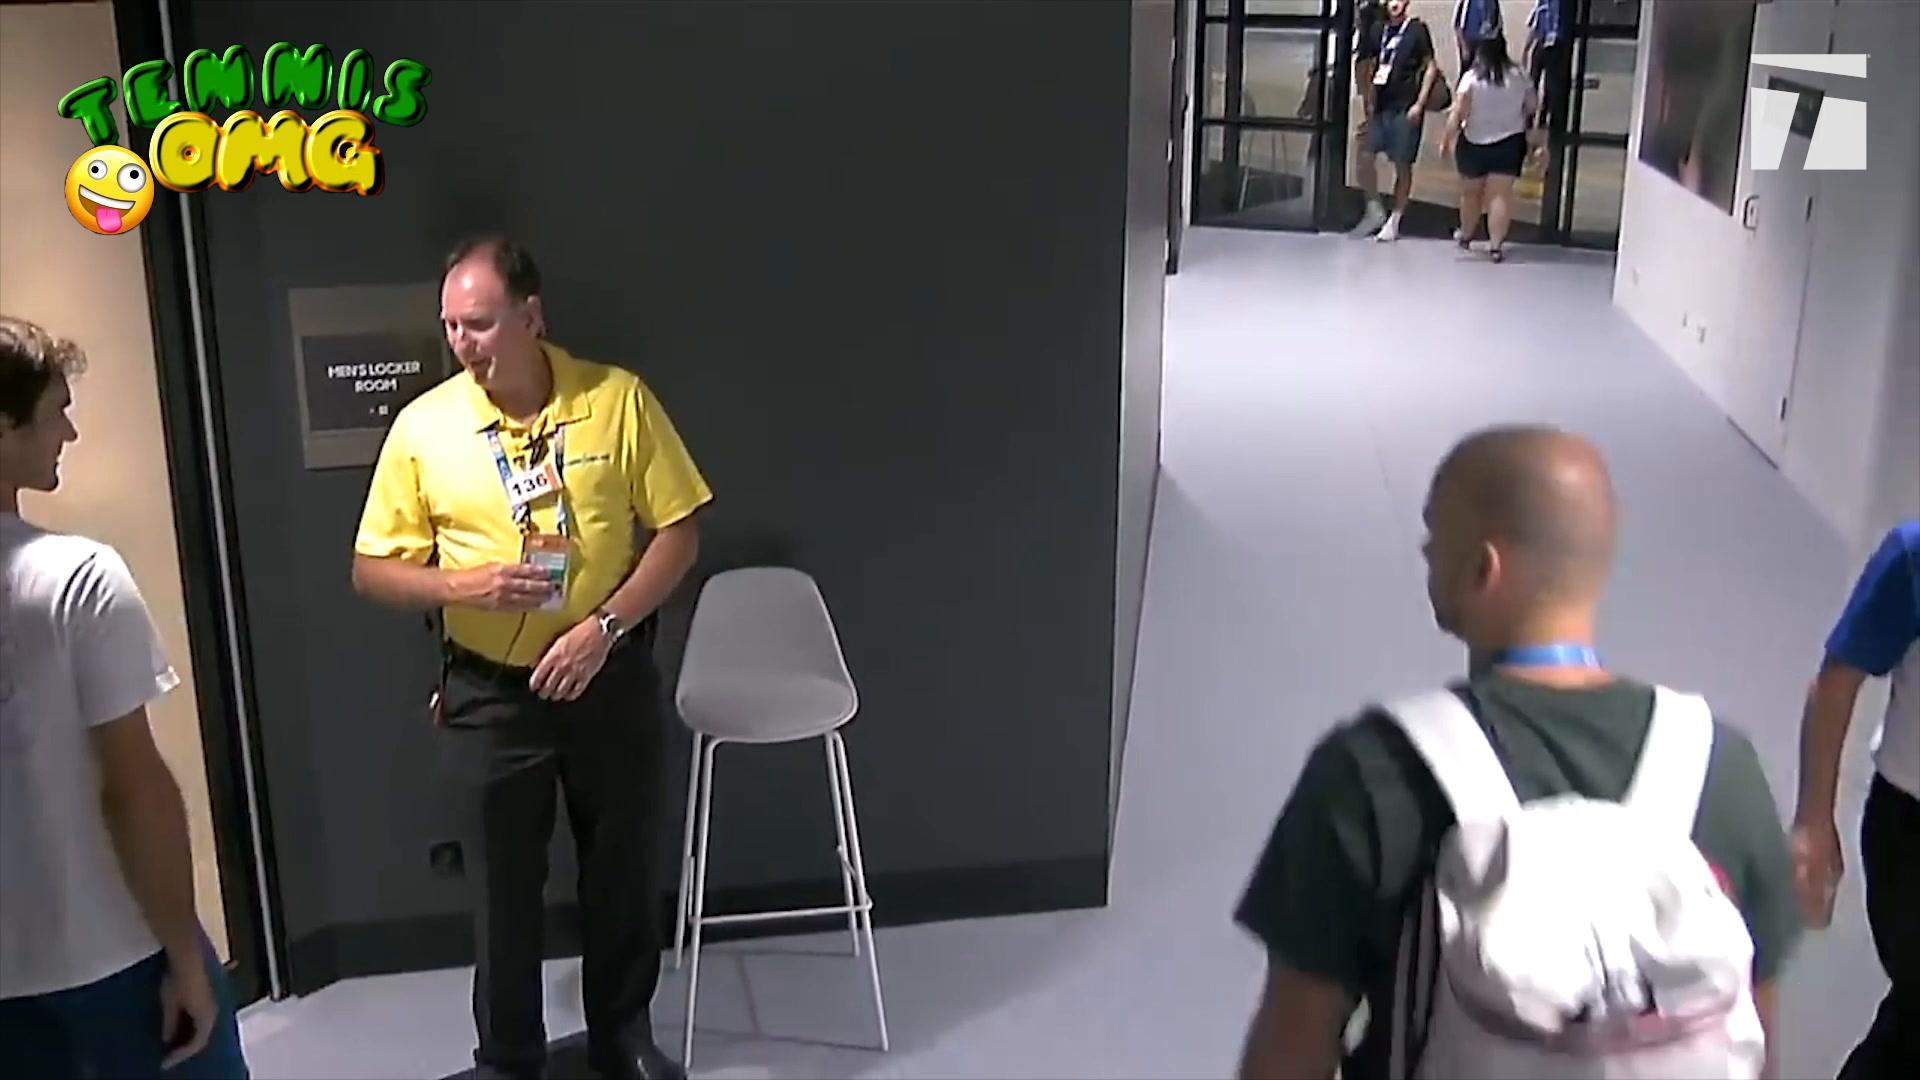 WATCH: Federer denied entry at locker room in Oz